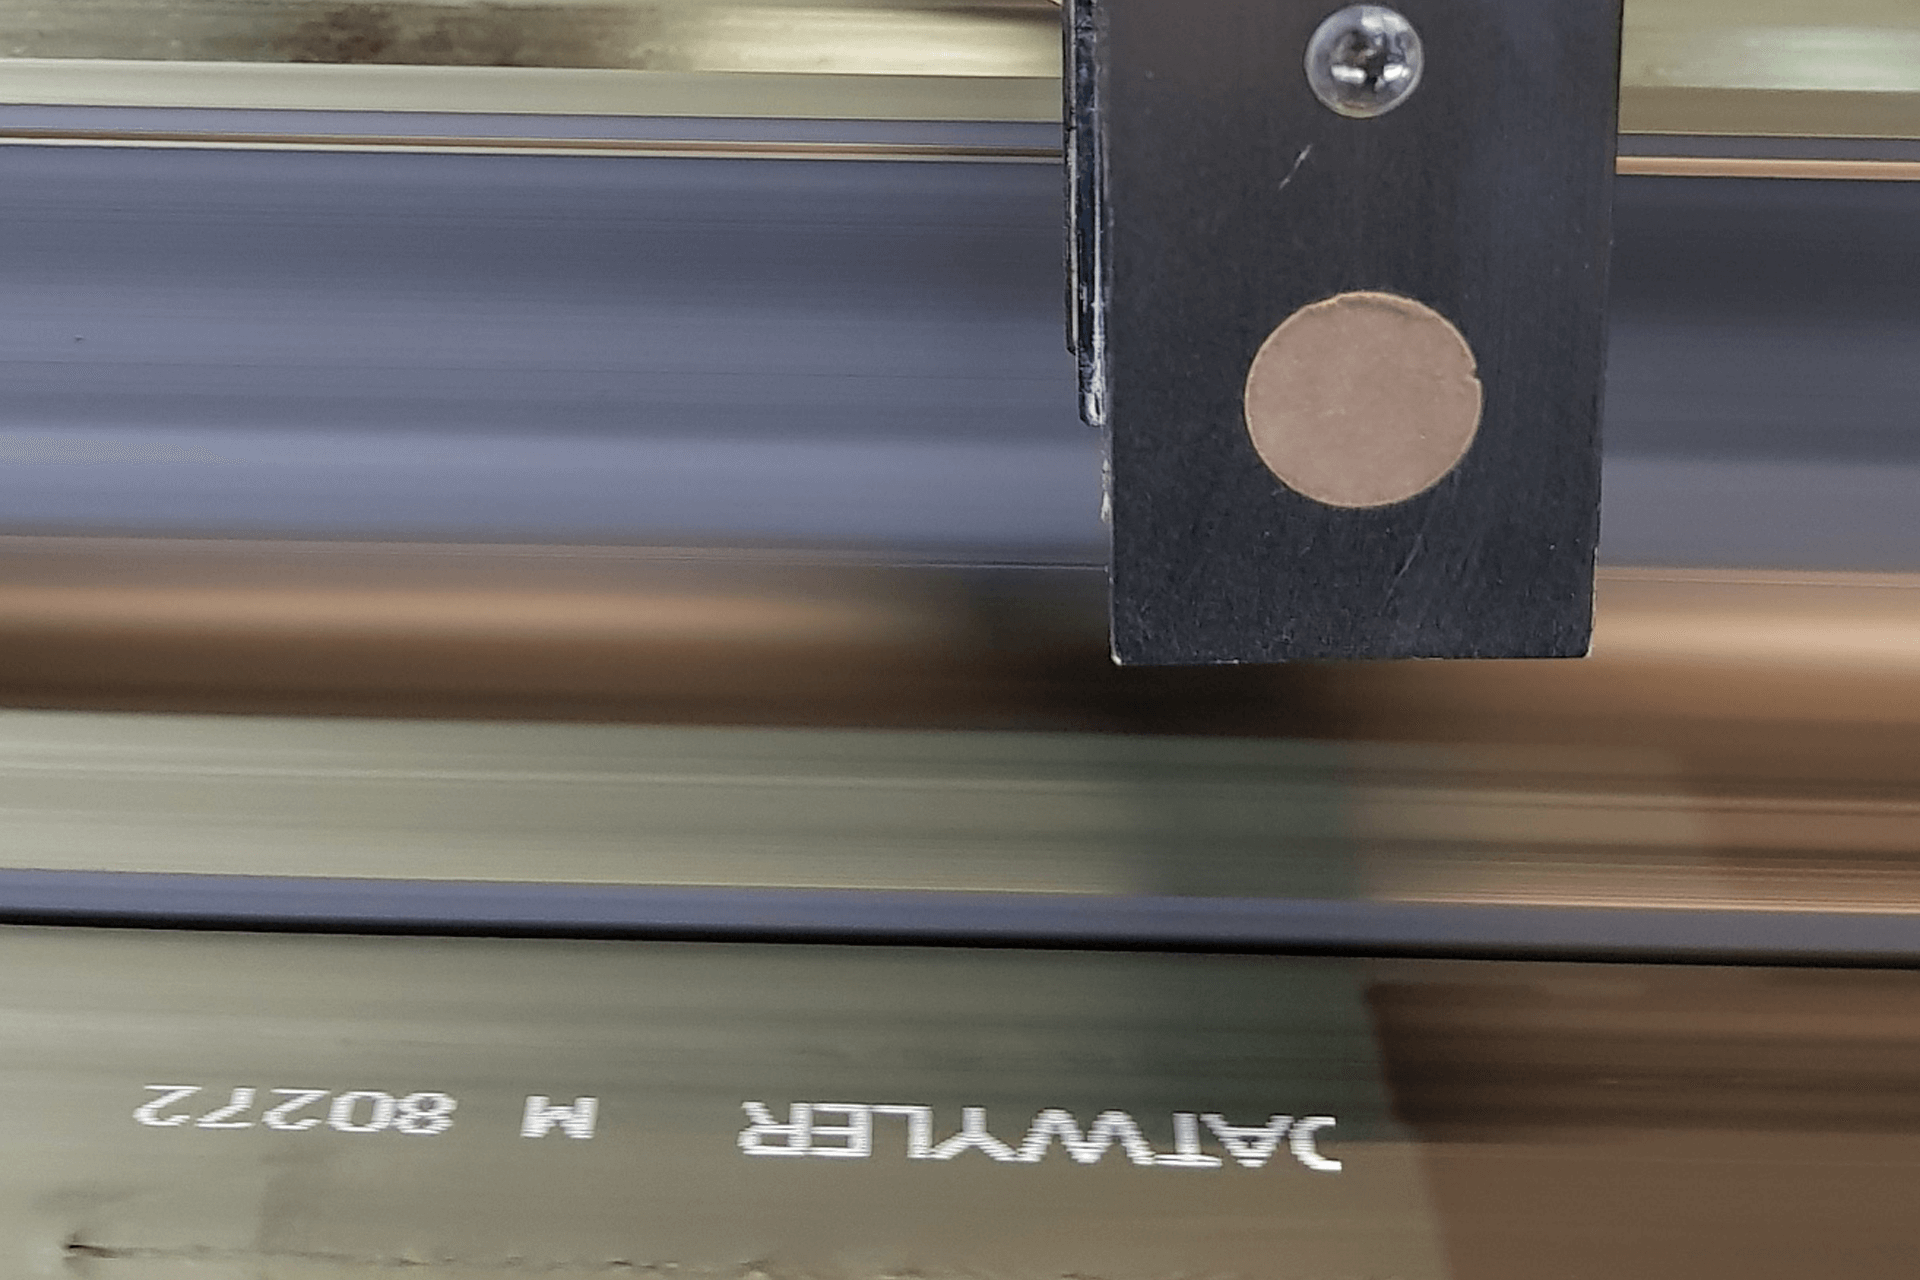 alphaJET Continuous Inkjet CIJ Print Head Datwyler Sealing Technologies PrintSafe